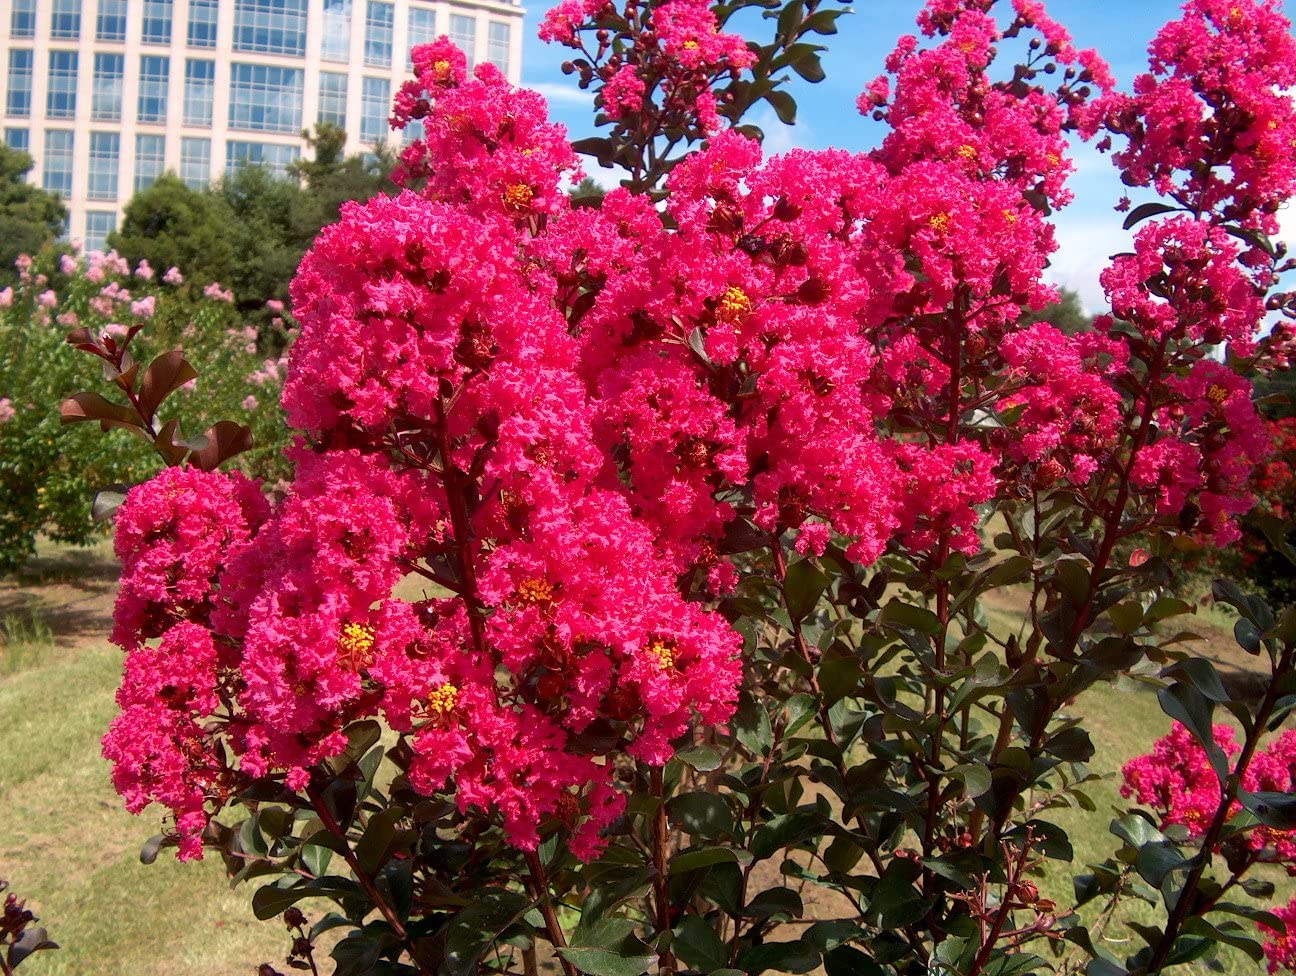 12 Cuttings Hot Pink Crape Myrtle Crepe Myrtle